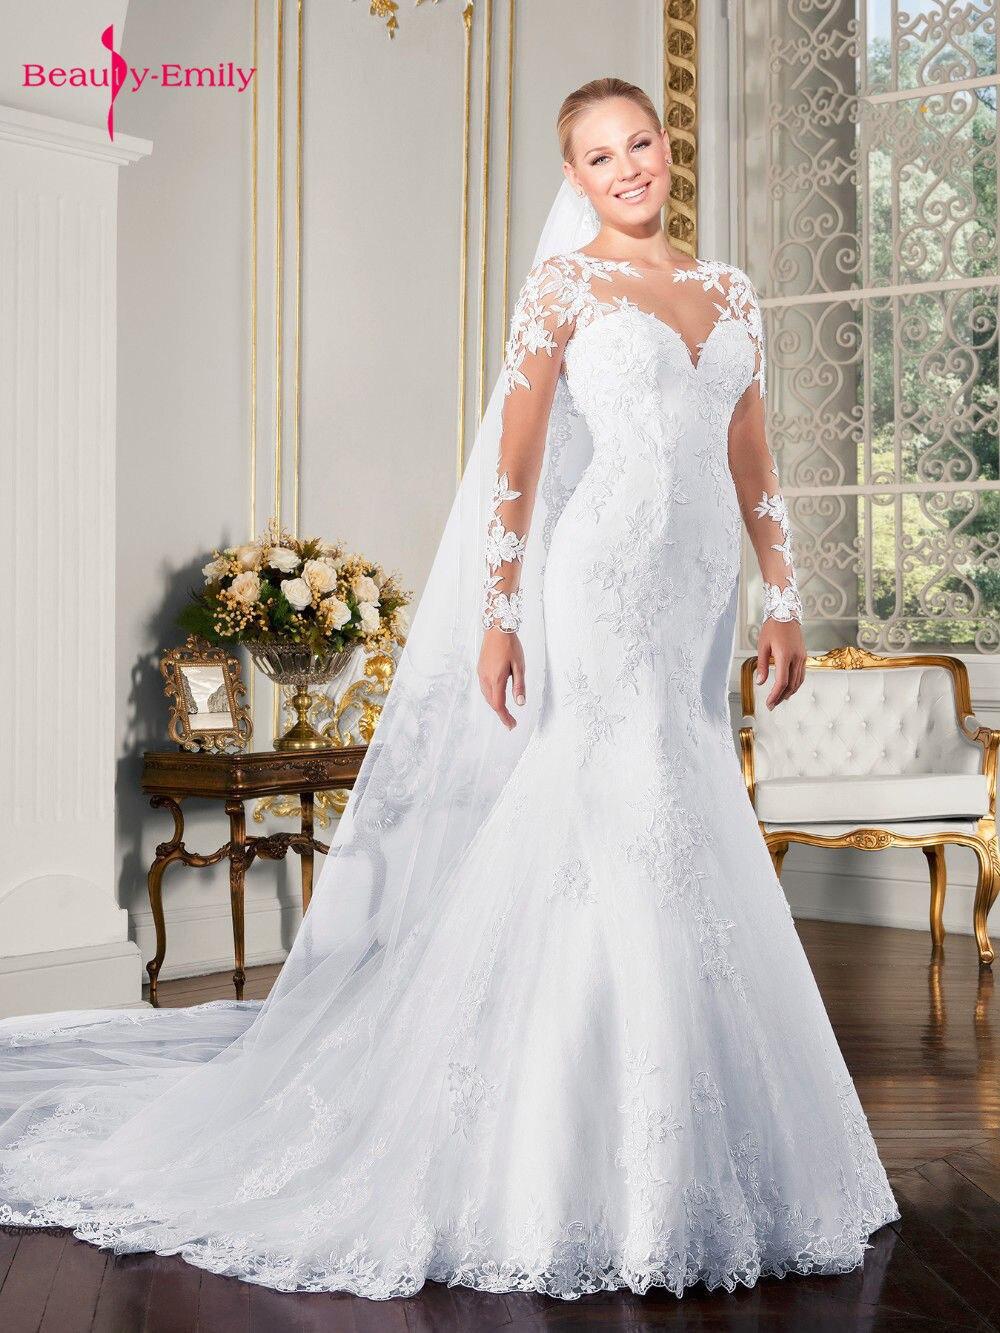 Beauty Emily Luxurious Embroidery Vestidos De Novia Long V Neck Lace Appliques Mermaid Wedding Dresses 19 Backless Bridal Gown 1